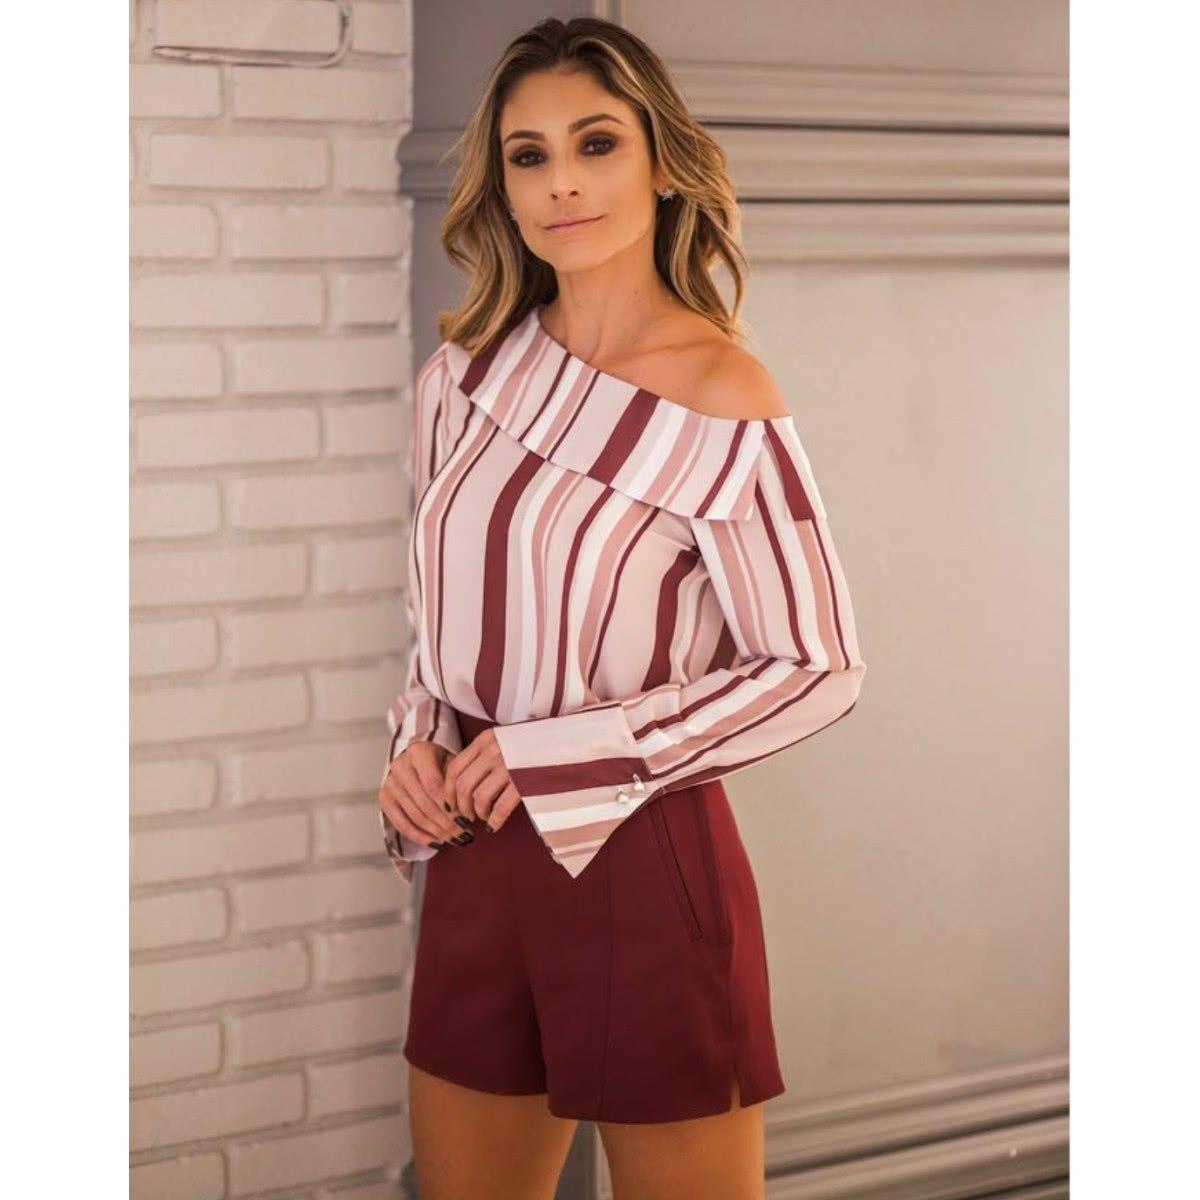 Blusa Ombro Caido Listra Tops Modernos Ideias Fashion Roupas